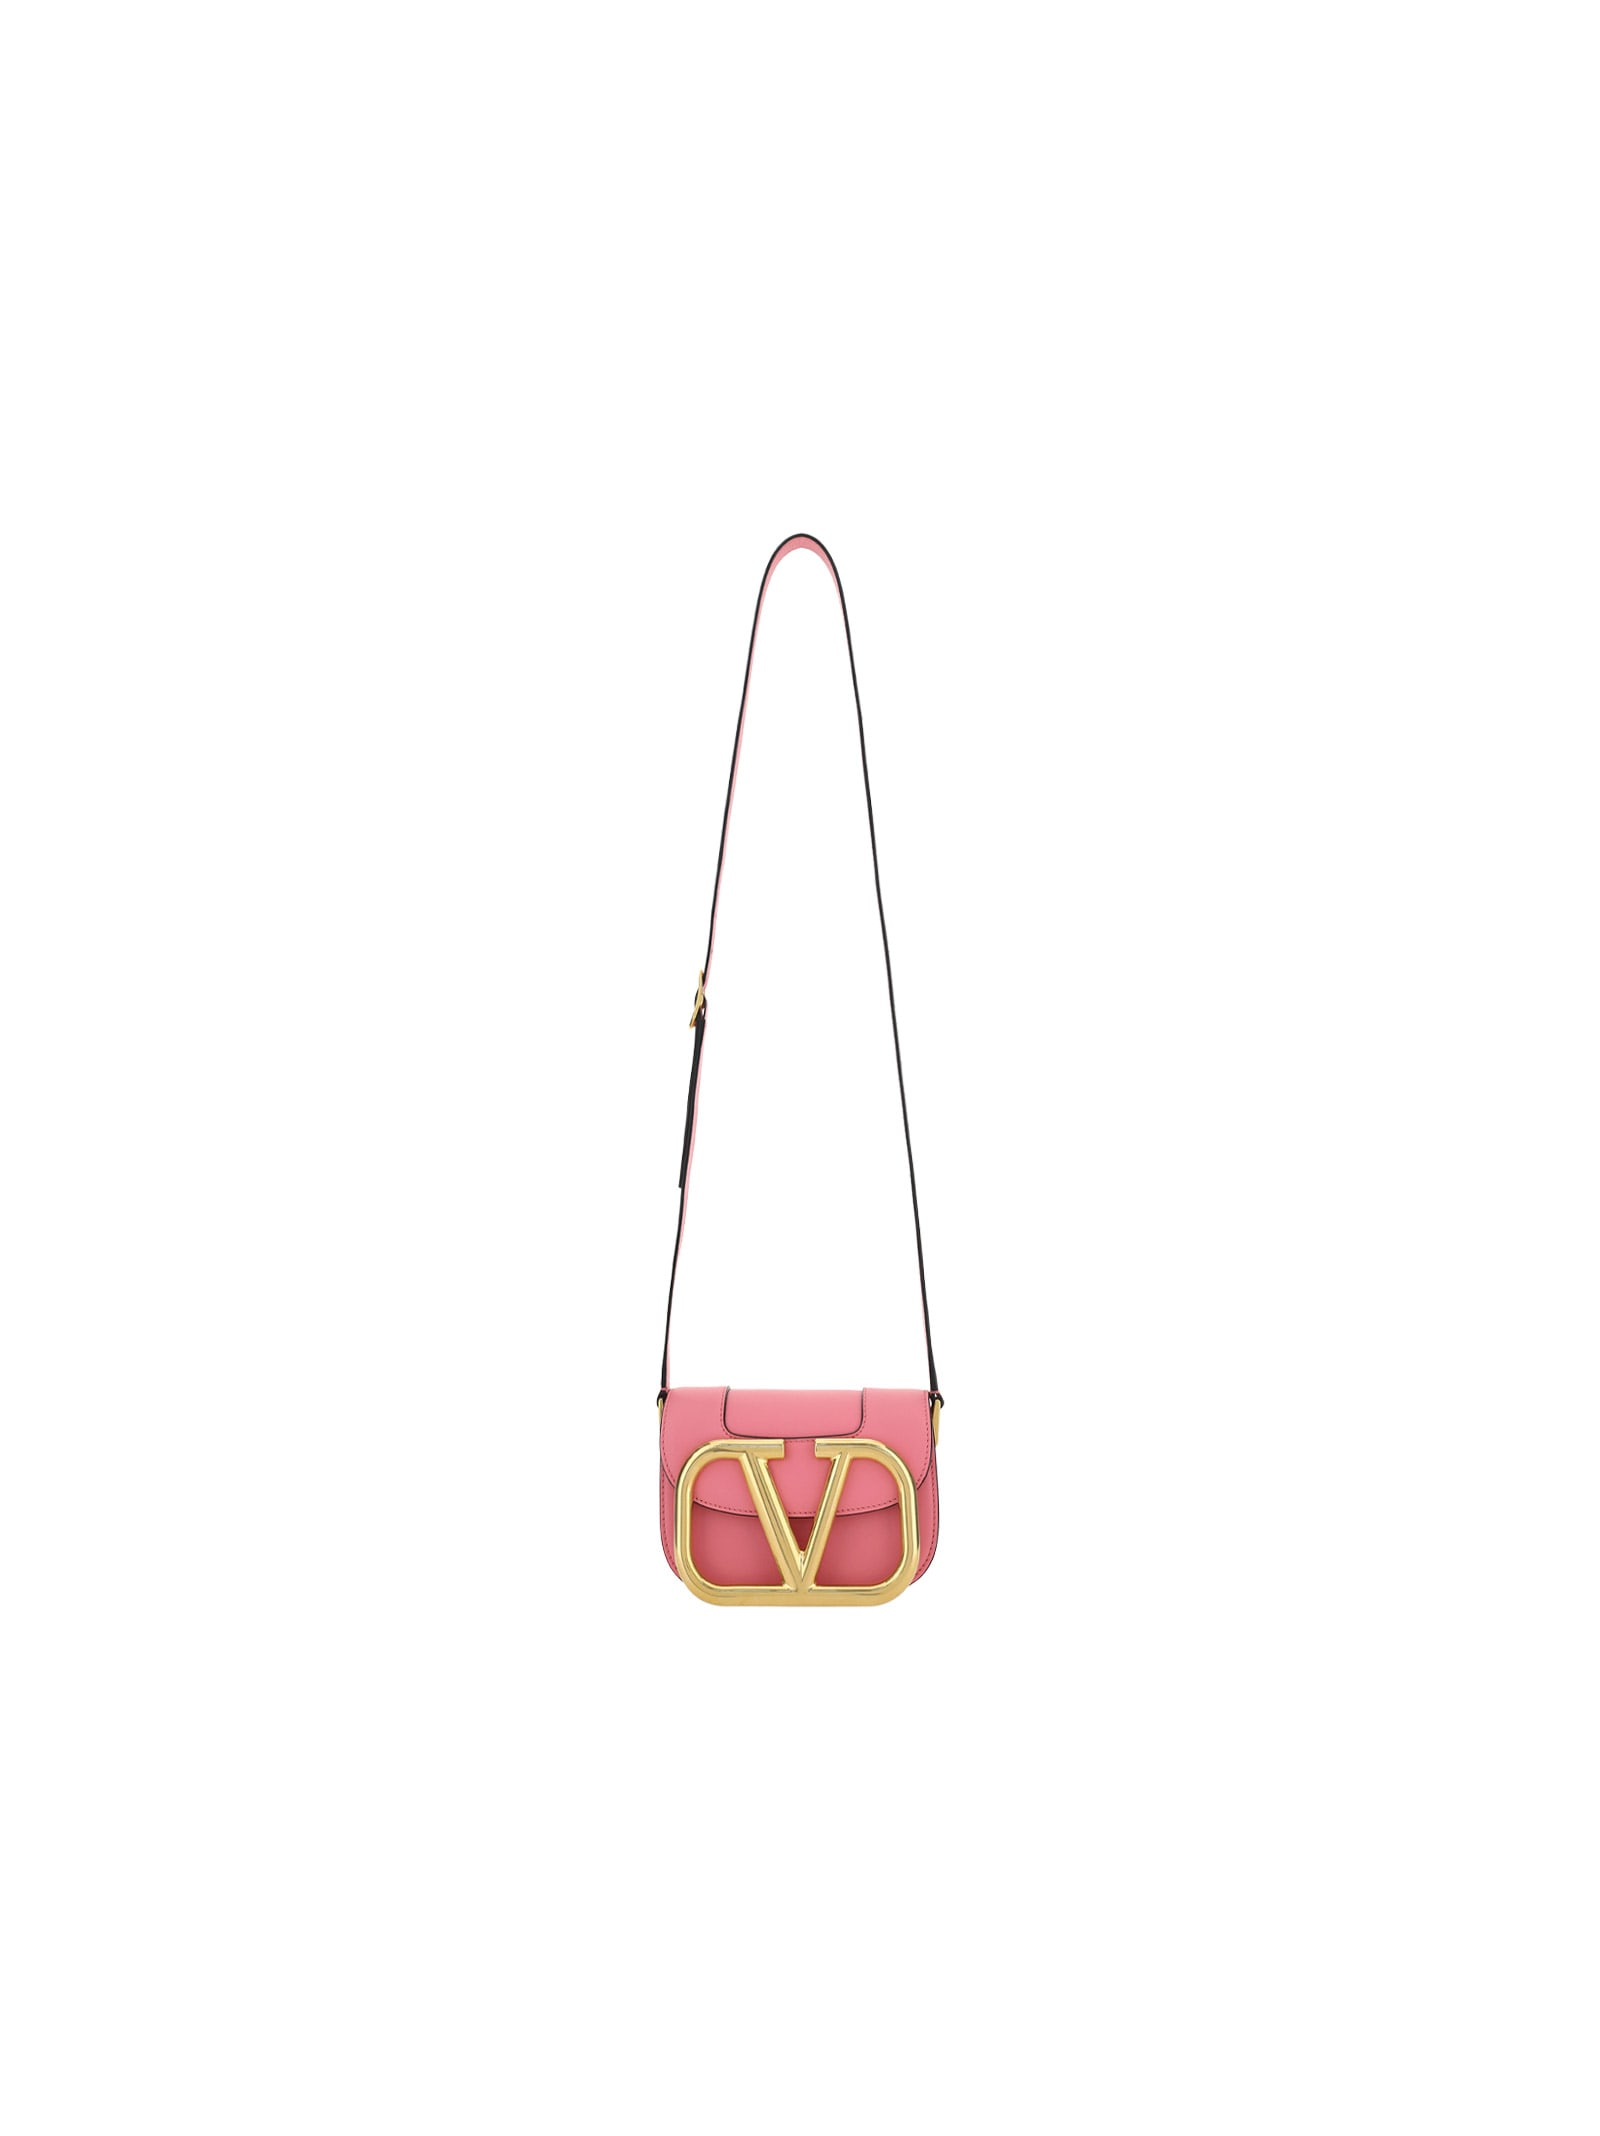 Valentino Garavani Supervee Small Shoulder Bag